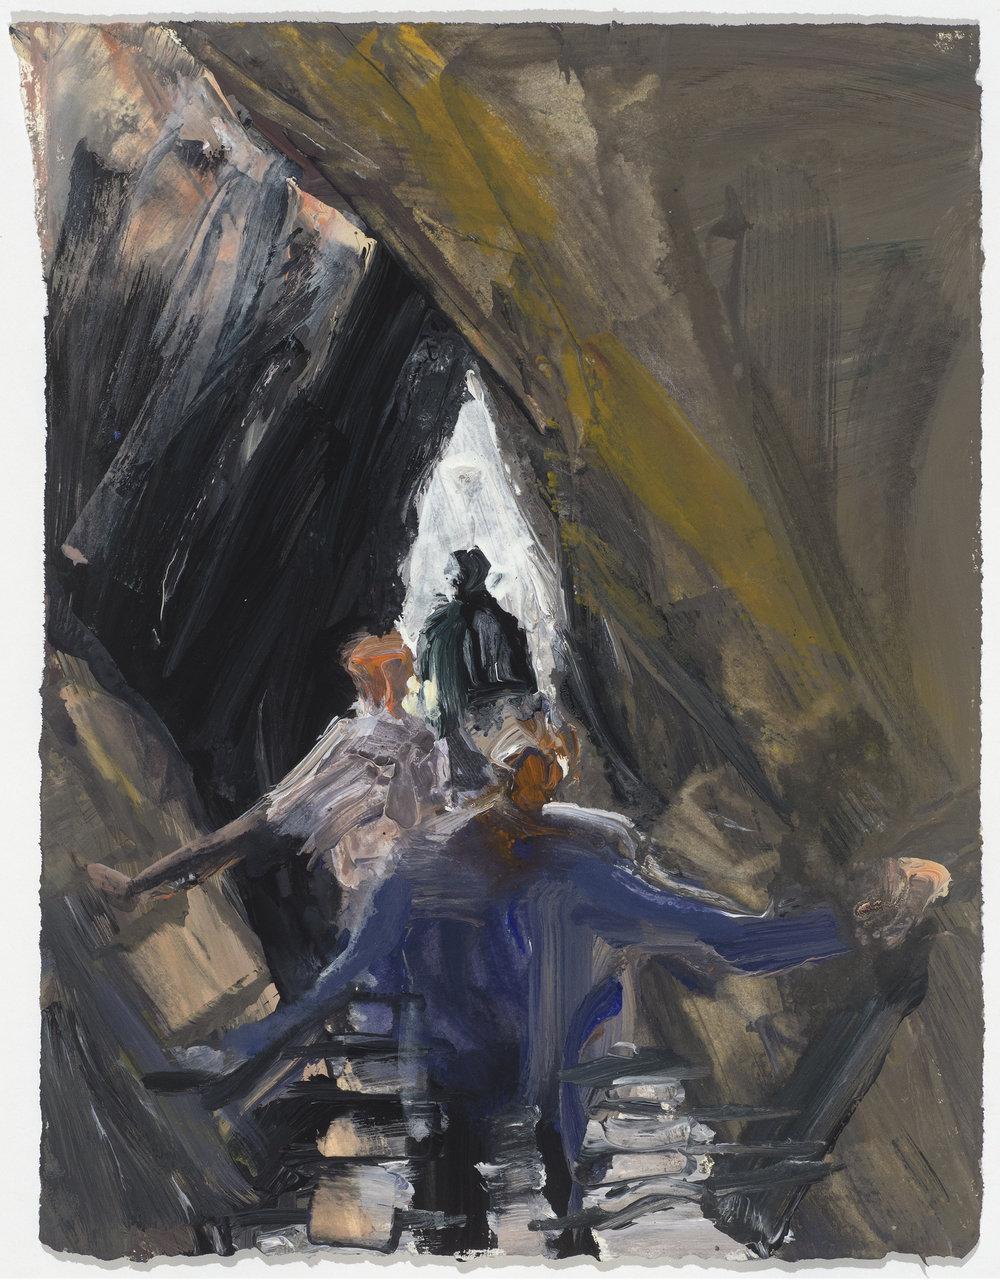 Stairs/Diamond 10/16  鑽型樓梯10/16   Euan Macleod , 2016  Acrylic on paper, 33 x 25 cm, HKD 8,000 framed